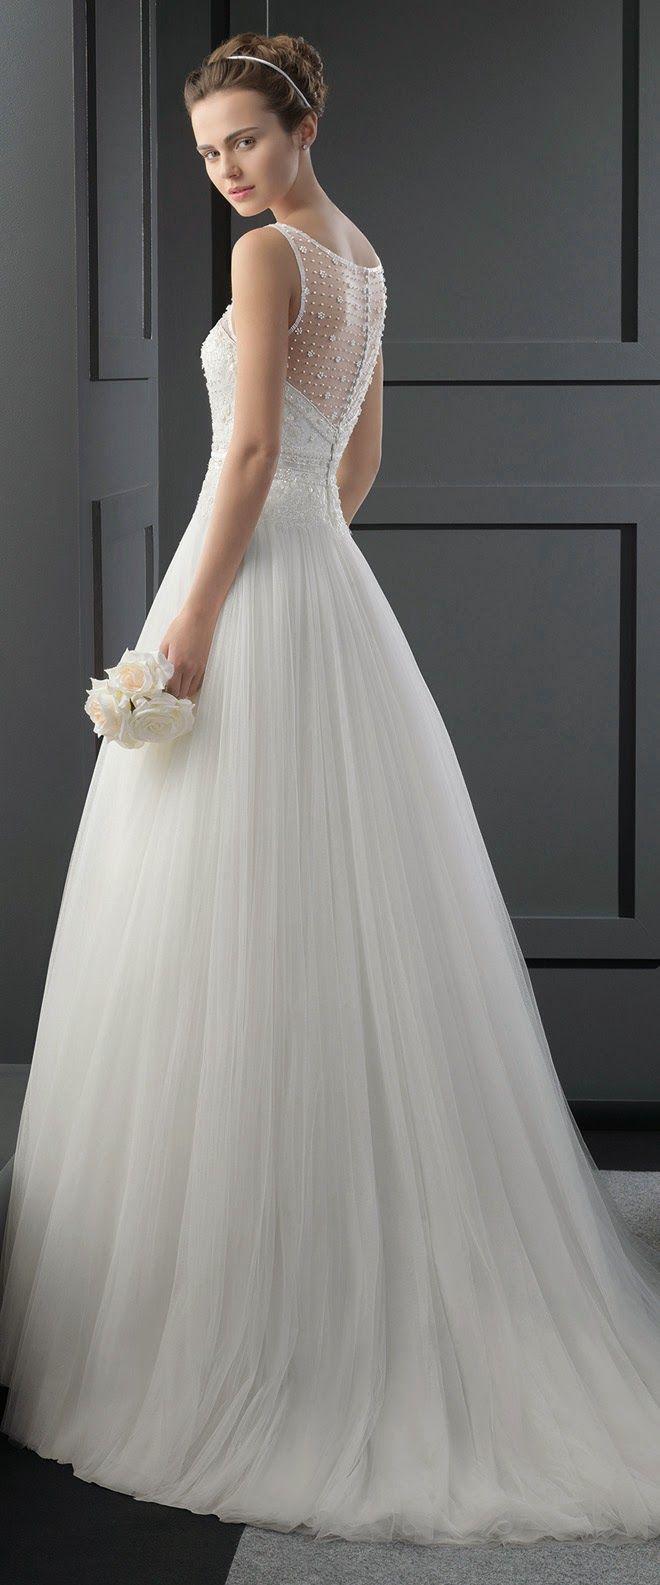 Wedding-Dresses-0487